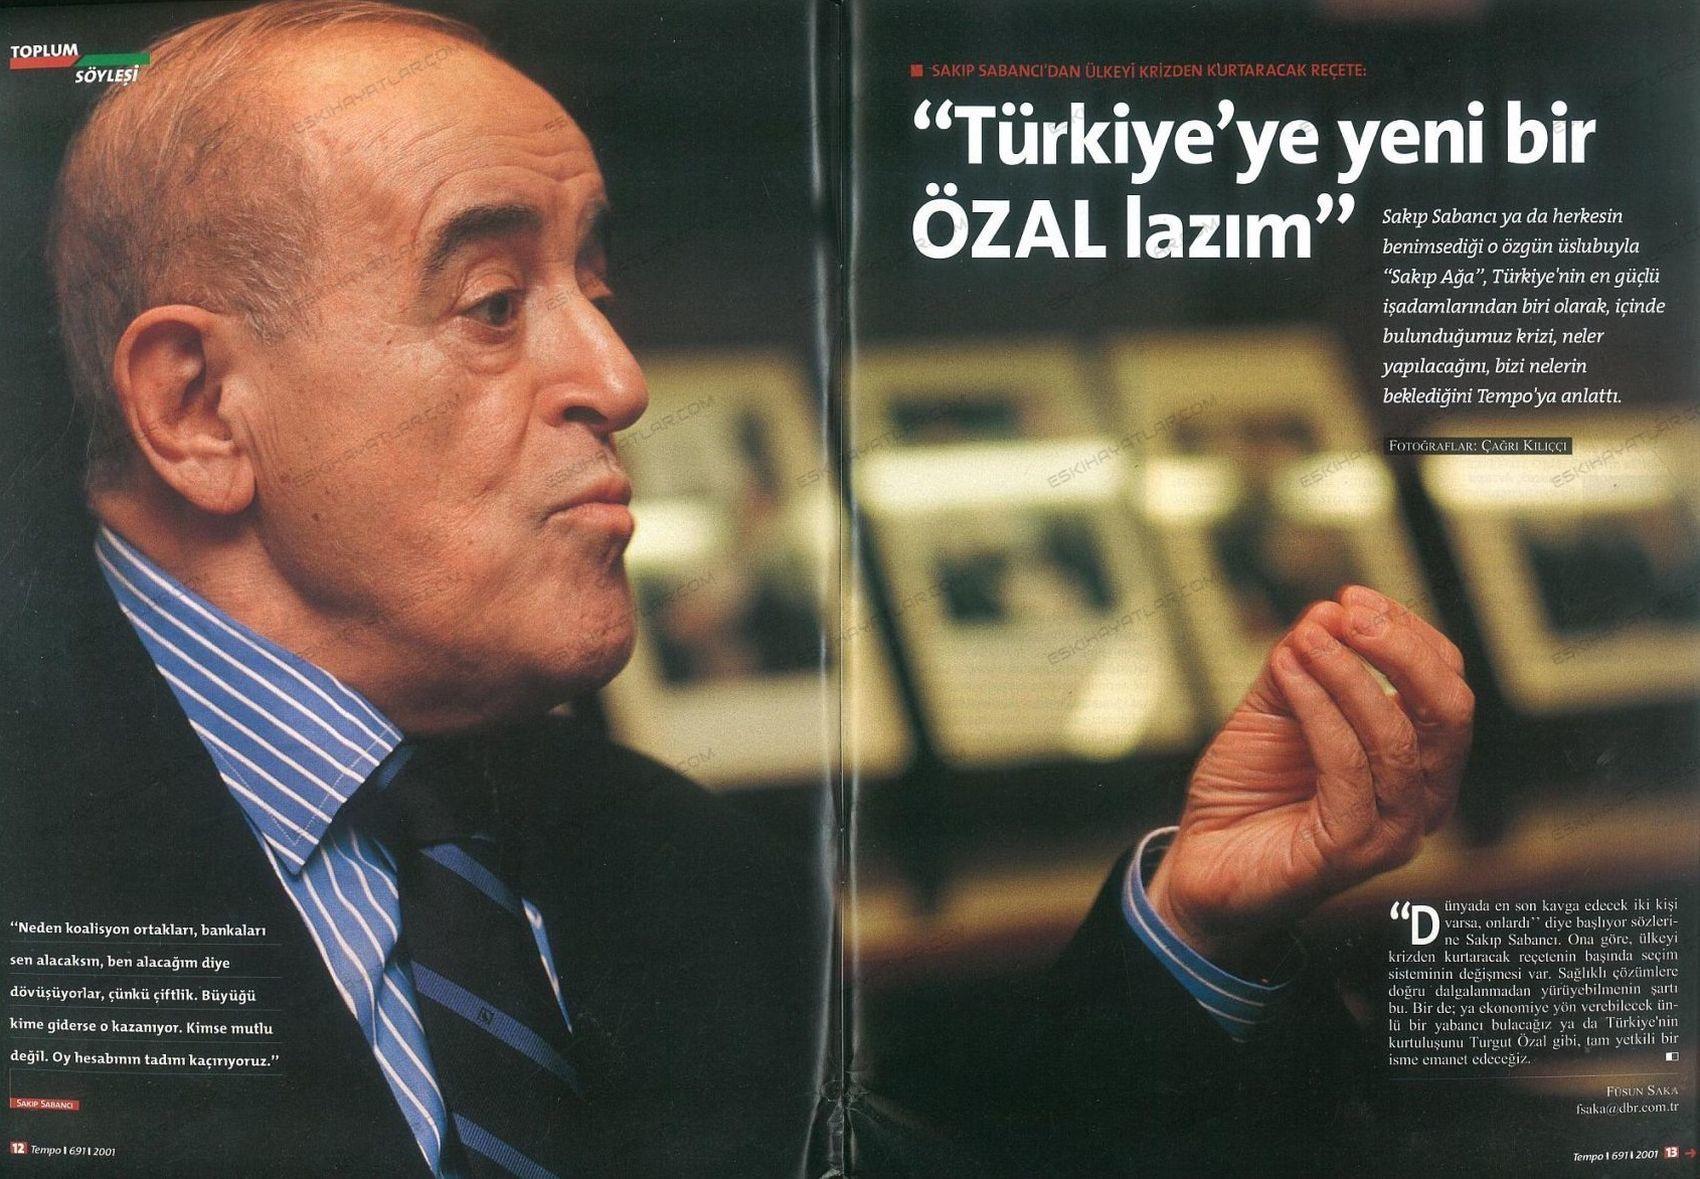 0135-sakip-sabanci-roportaji-2001-tempo-dergisi-turkiyeye-yeni-bi-ozal-lazim (3) (1)